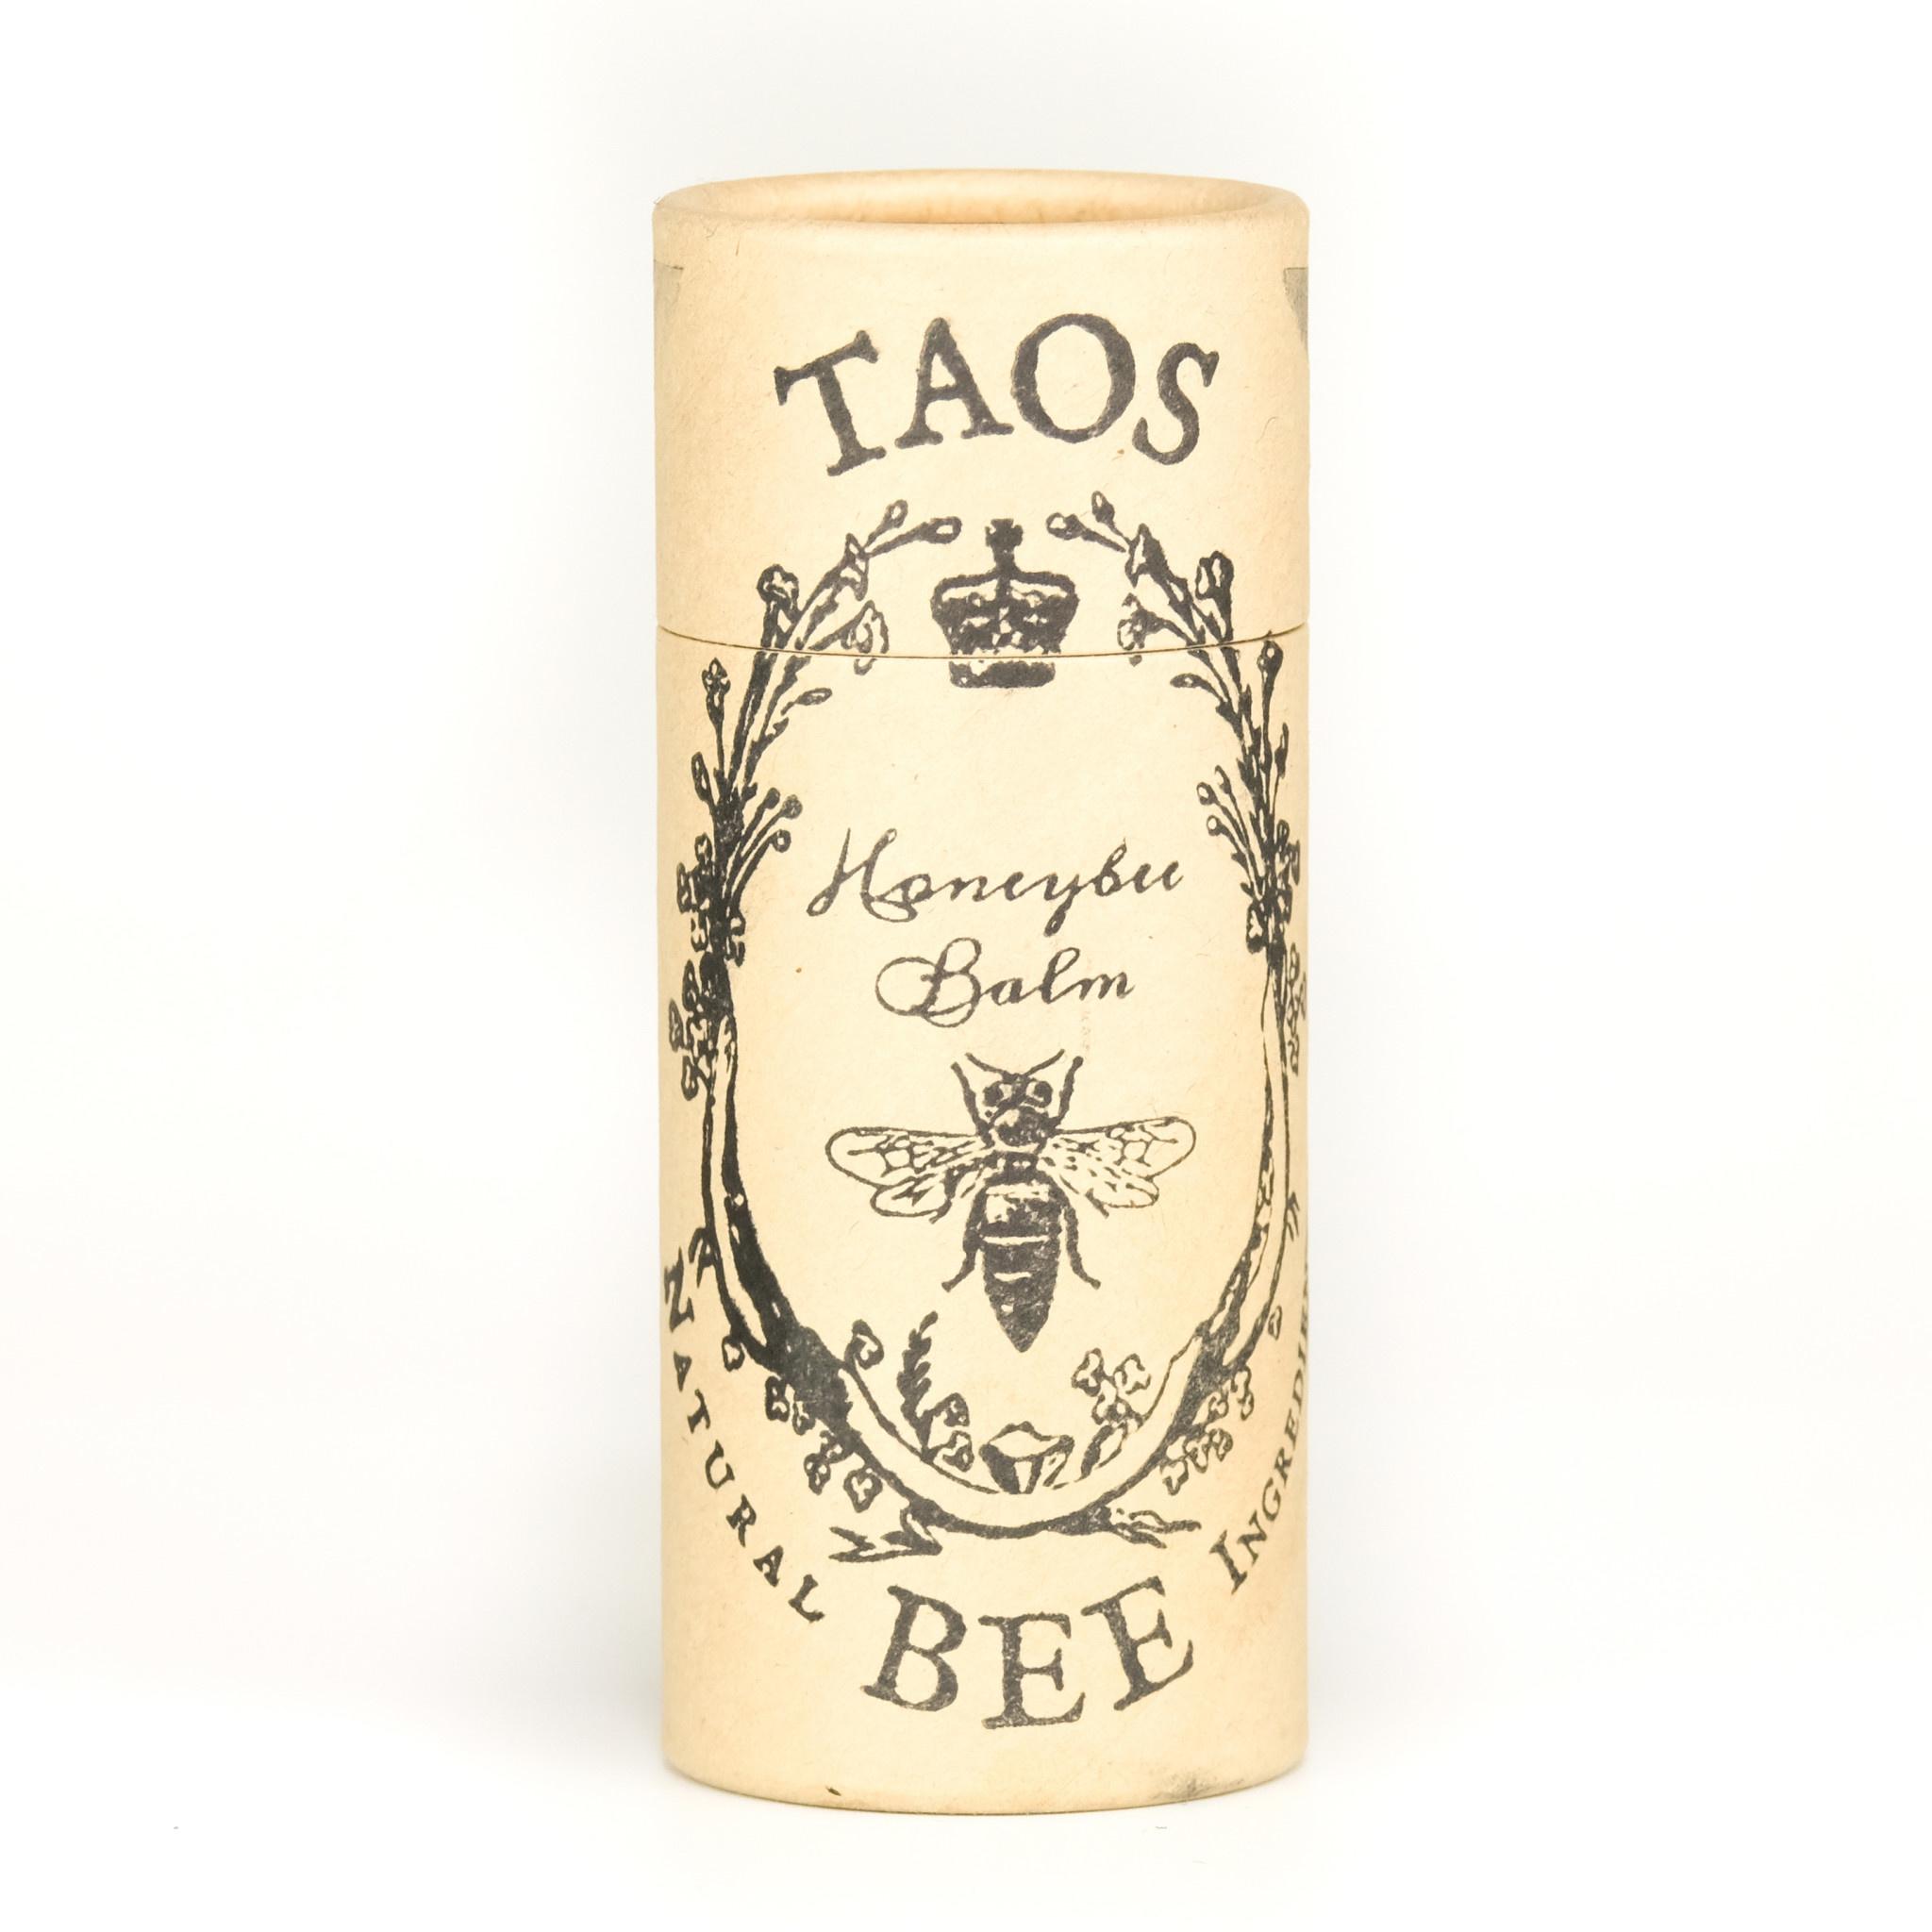 Taos Bee 2 oz Honeybee balm